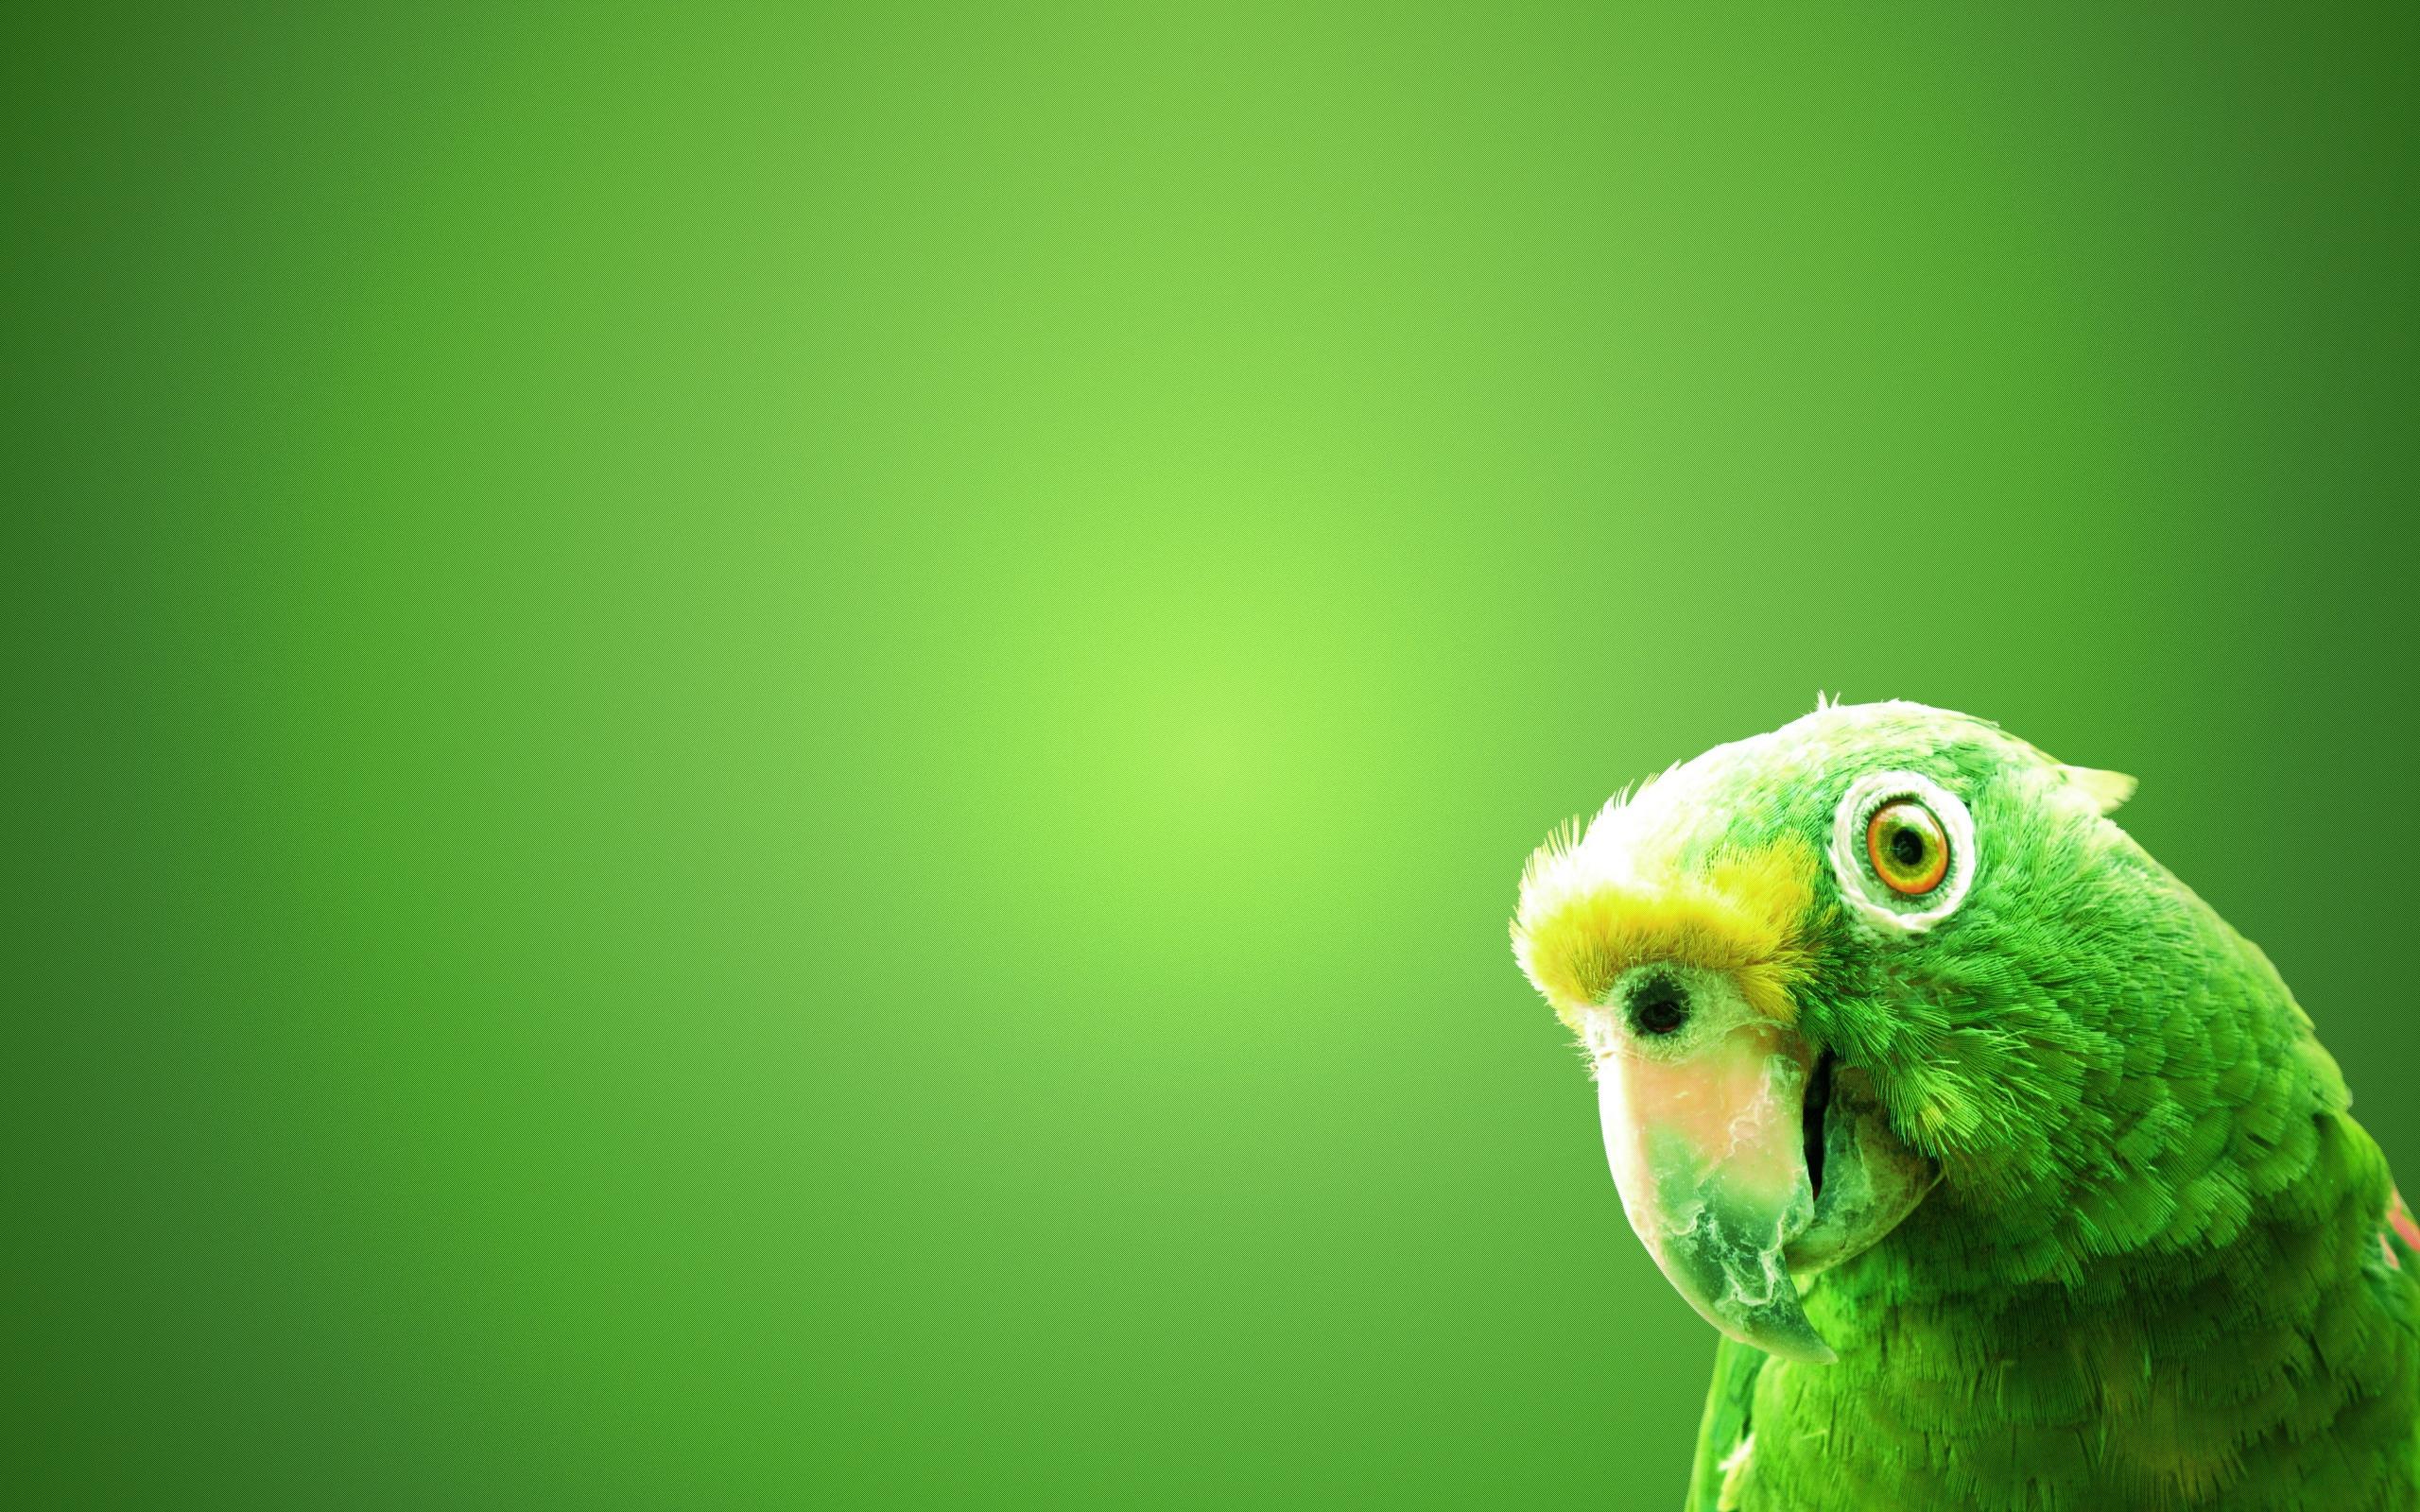 Parrot Free Wallpaper